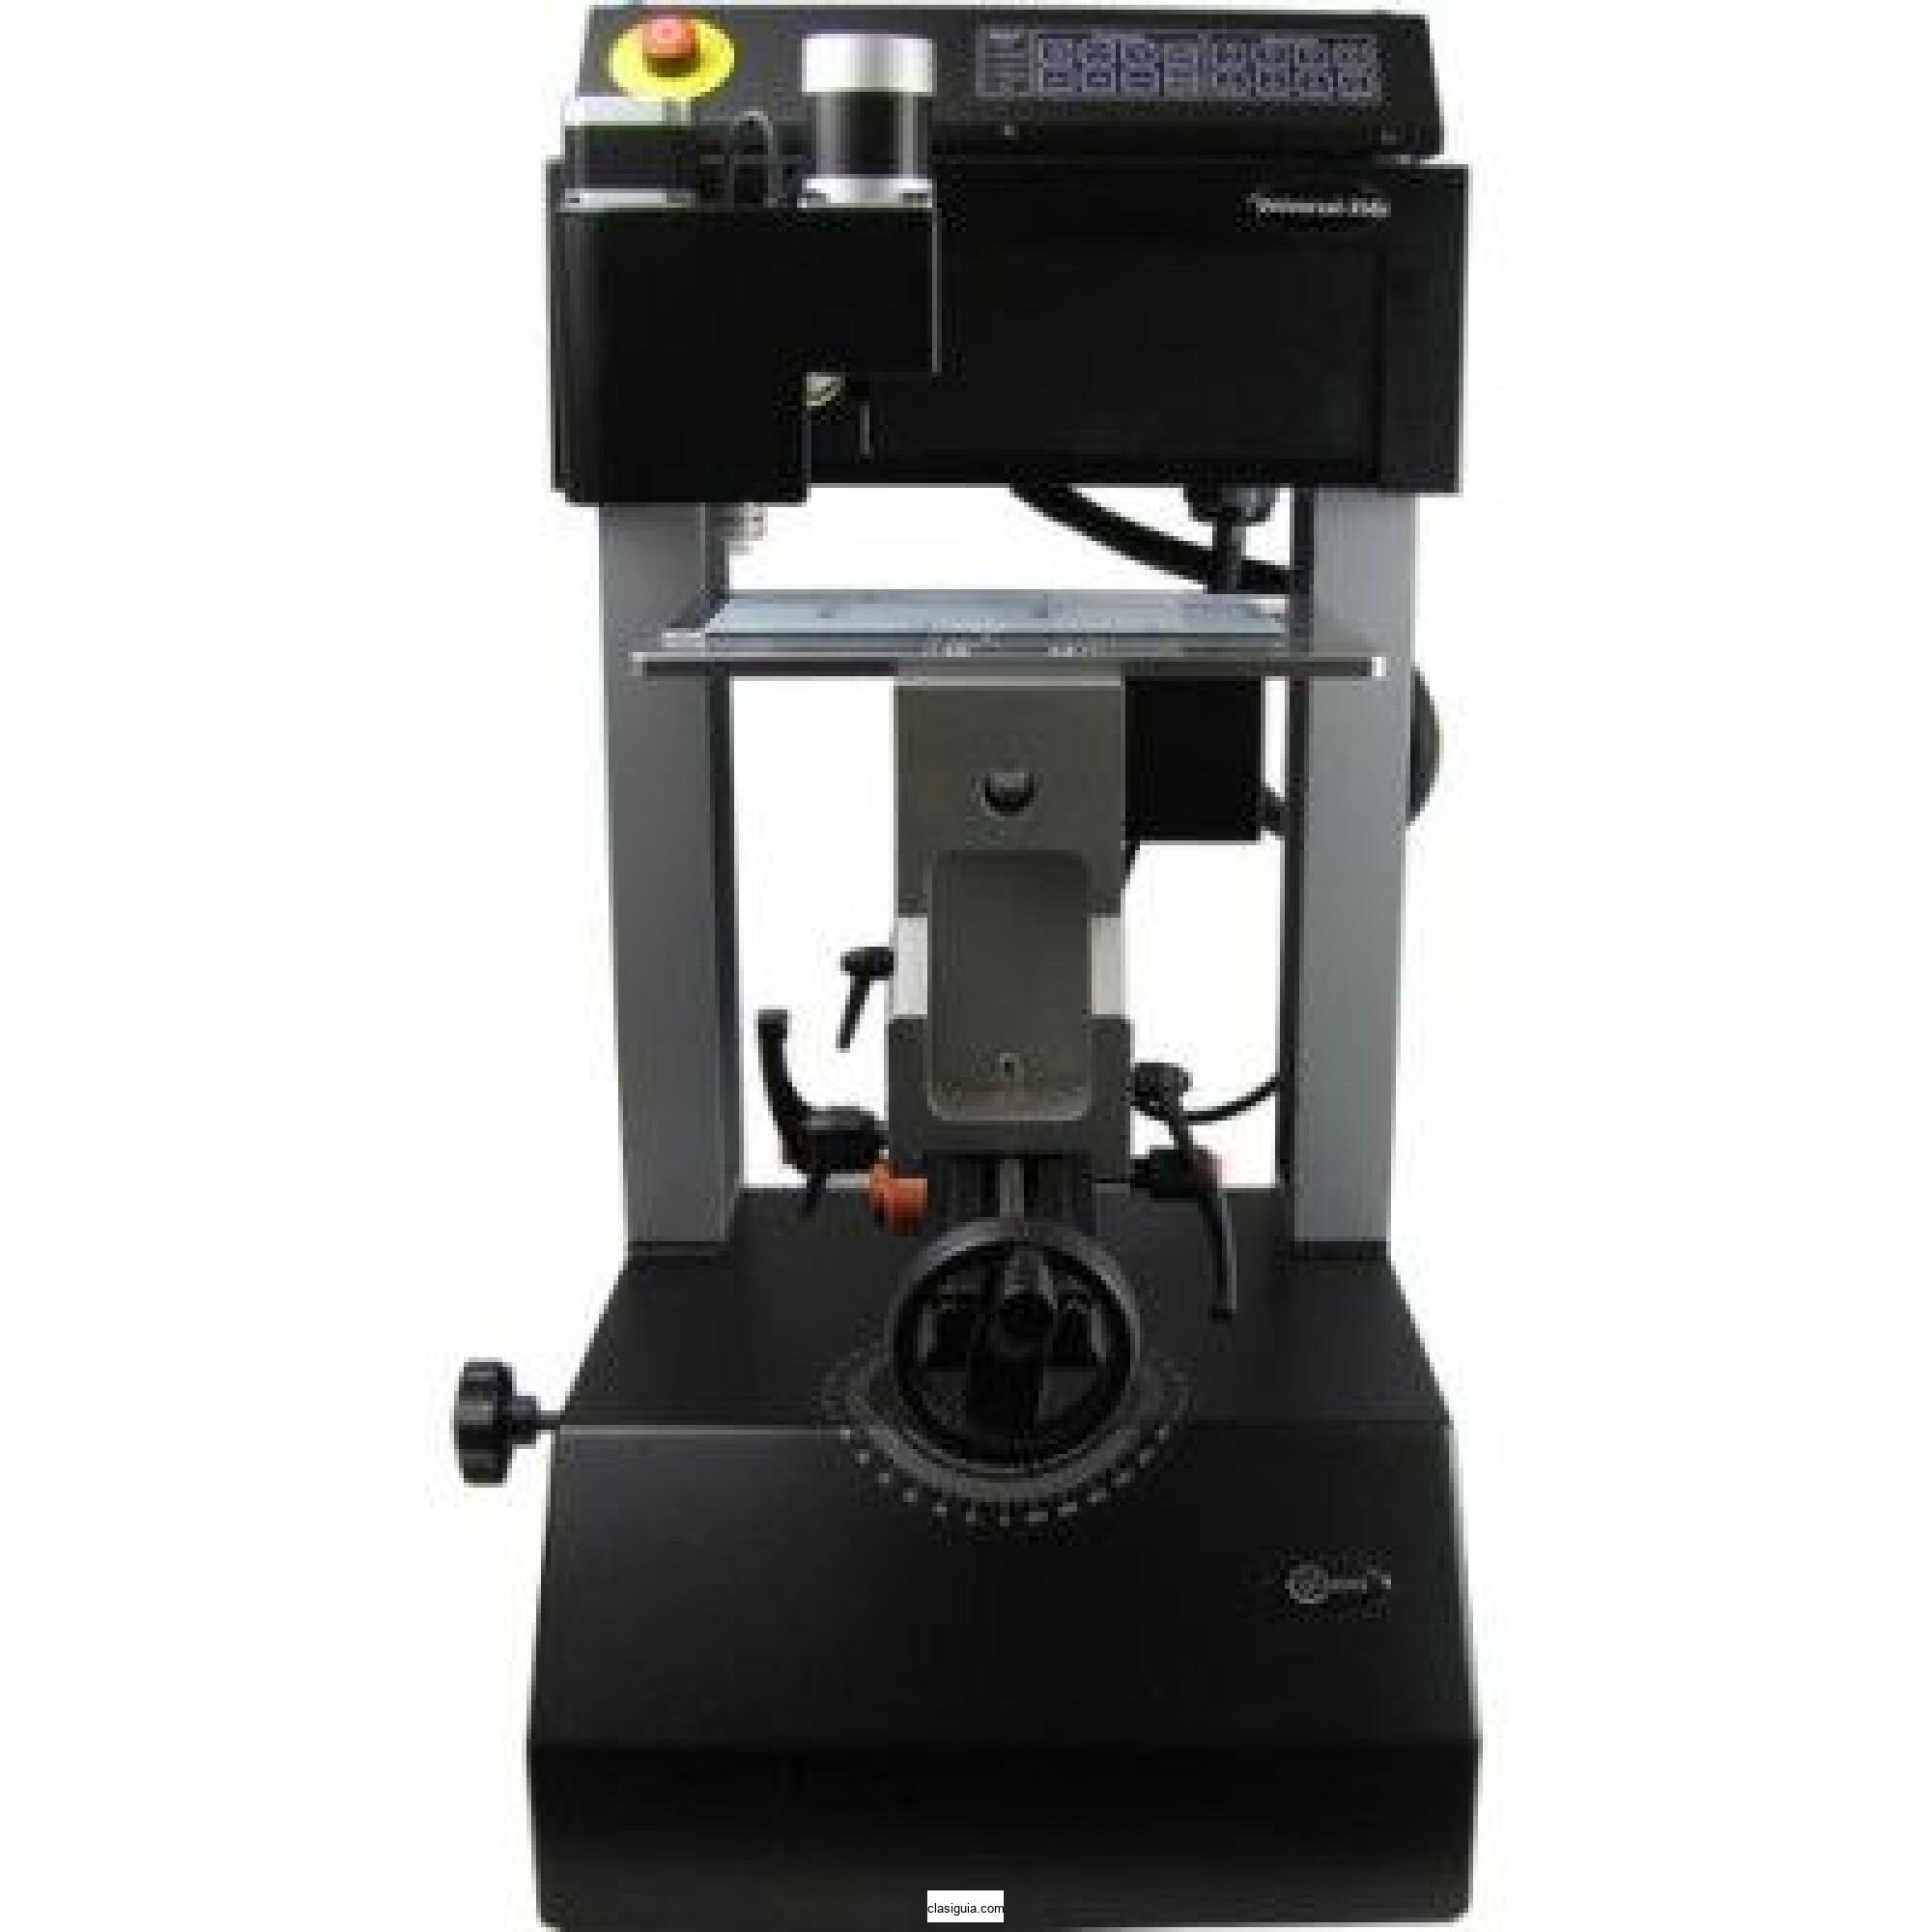 U-Marq Universal-350 Engraving Machine (MITRA PRINT)